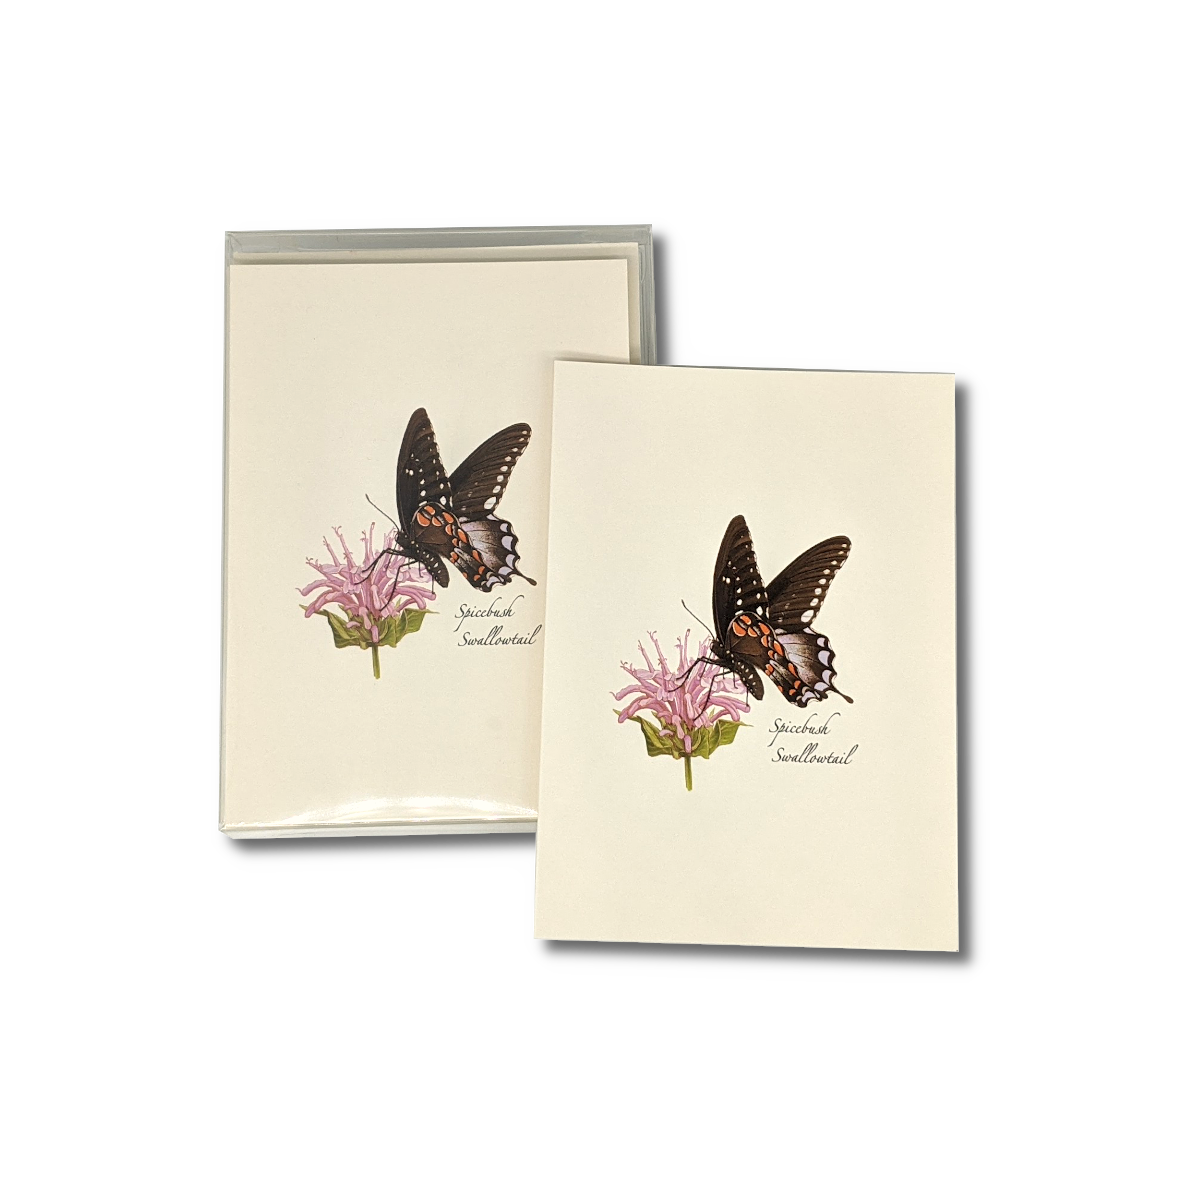 A box of Spicebush Swallowtail notecards